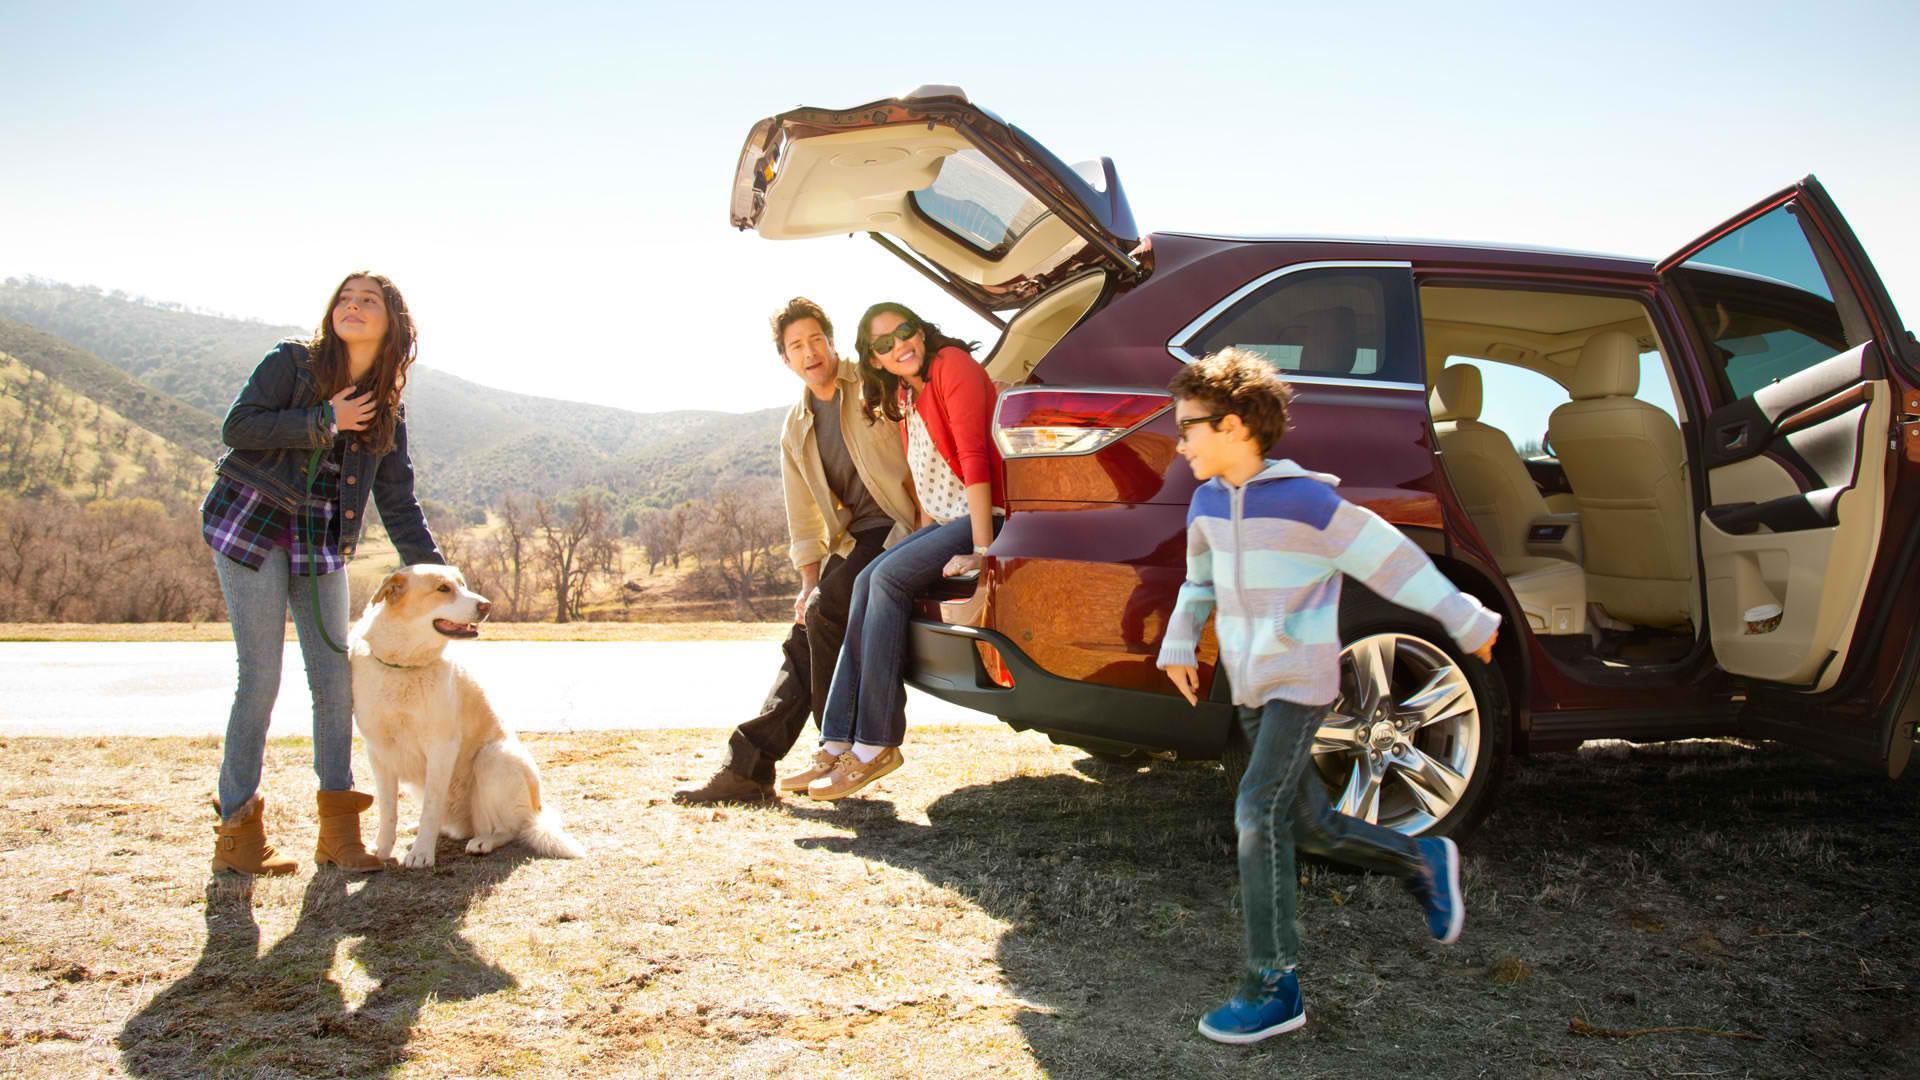 7 Alasan mobil berkursi tujuh bisa nge-hits saat dipakai hangout